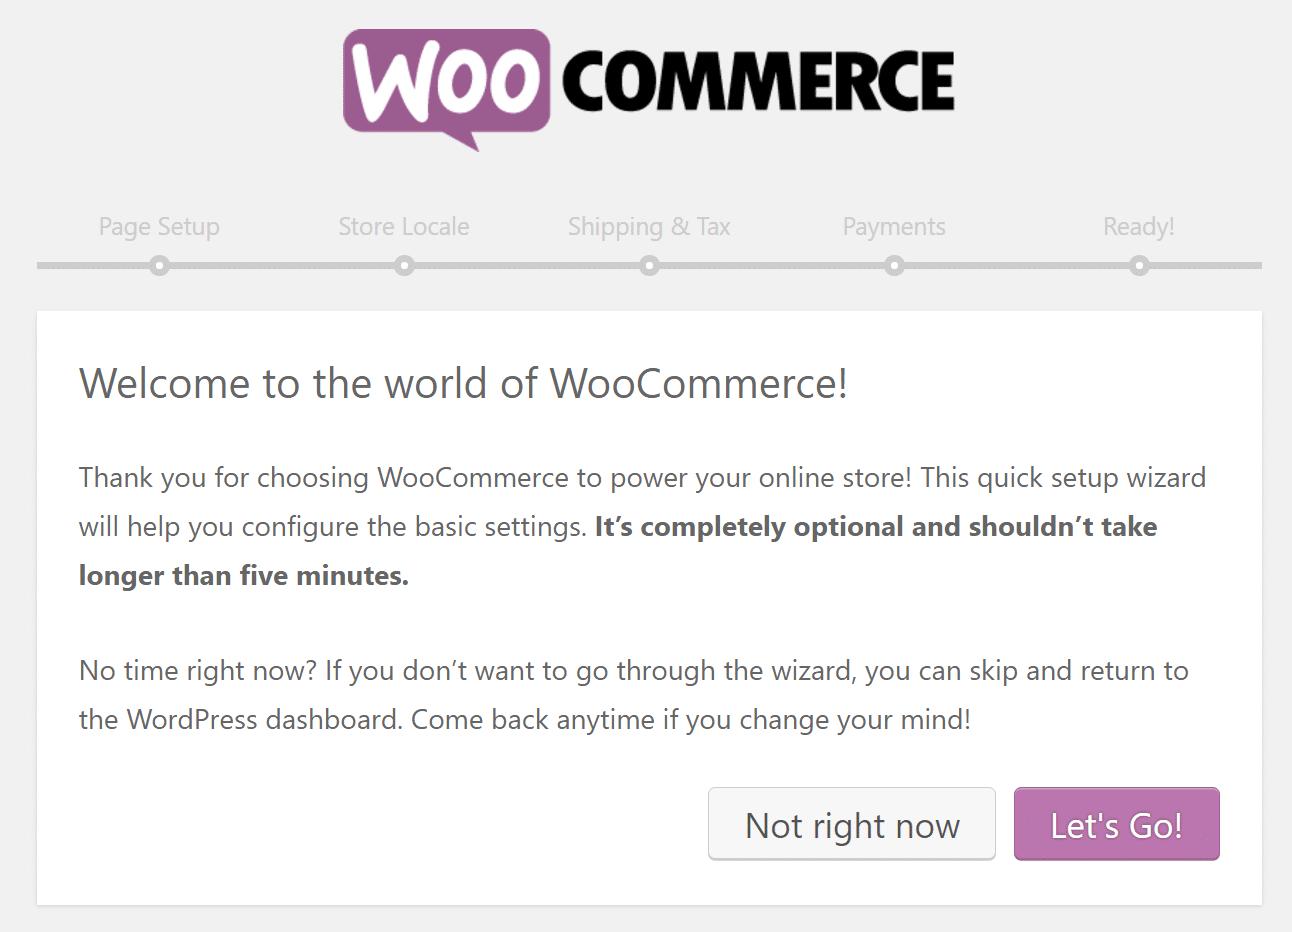 Tela de boas-vindas do WooCommerce